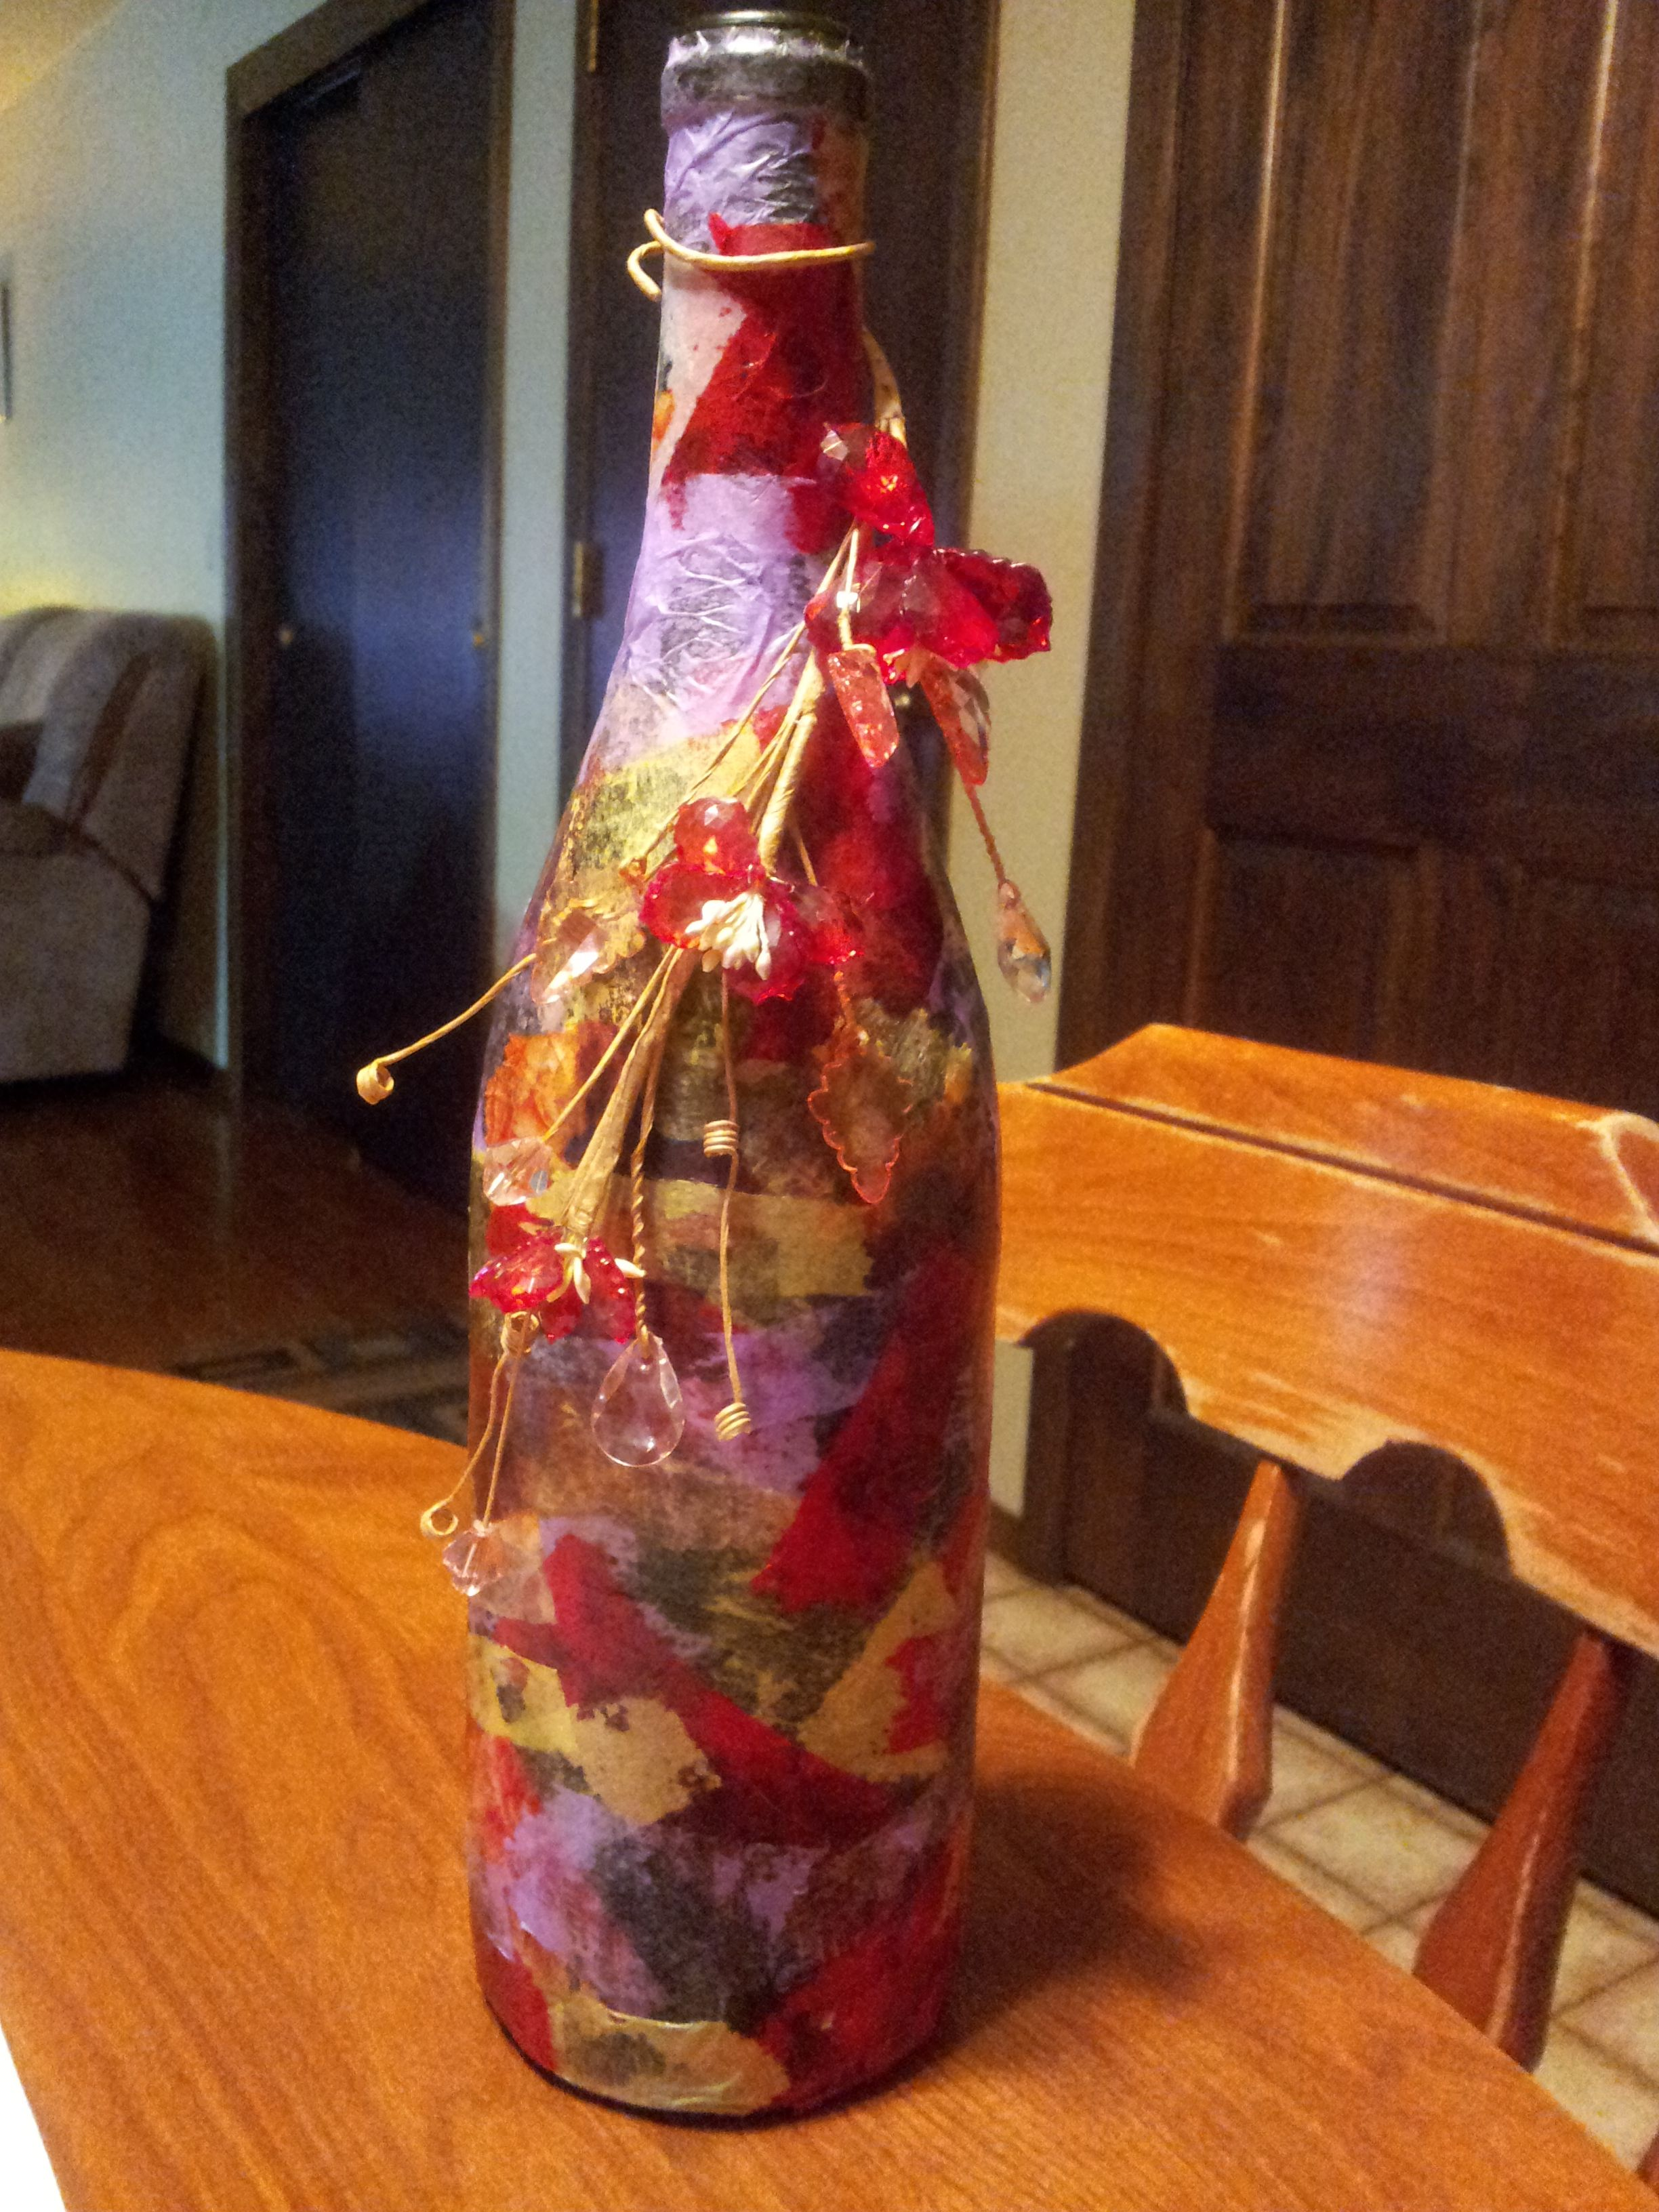 Wine Bottle Decoupaged With Tissue Paper Wine Bottle Crafts Bottles Decoration Wine Bottle Art